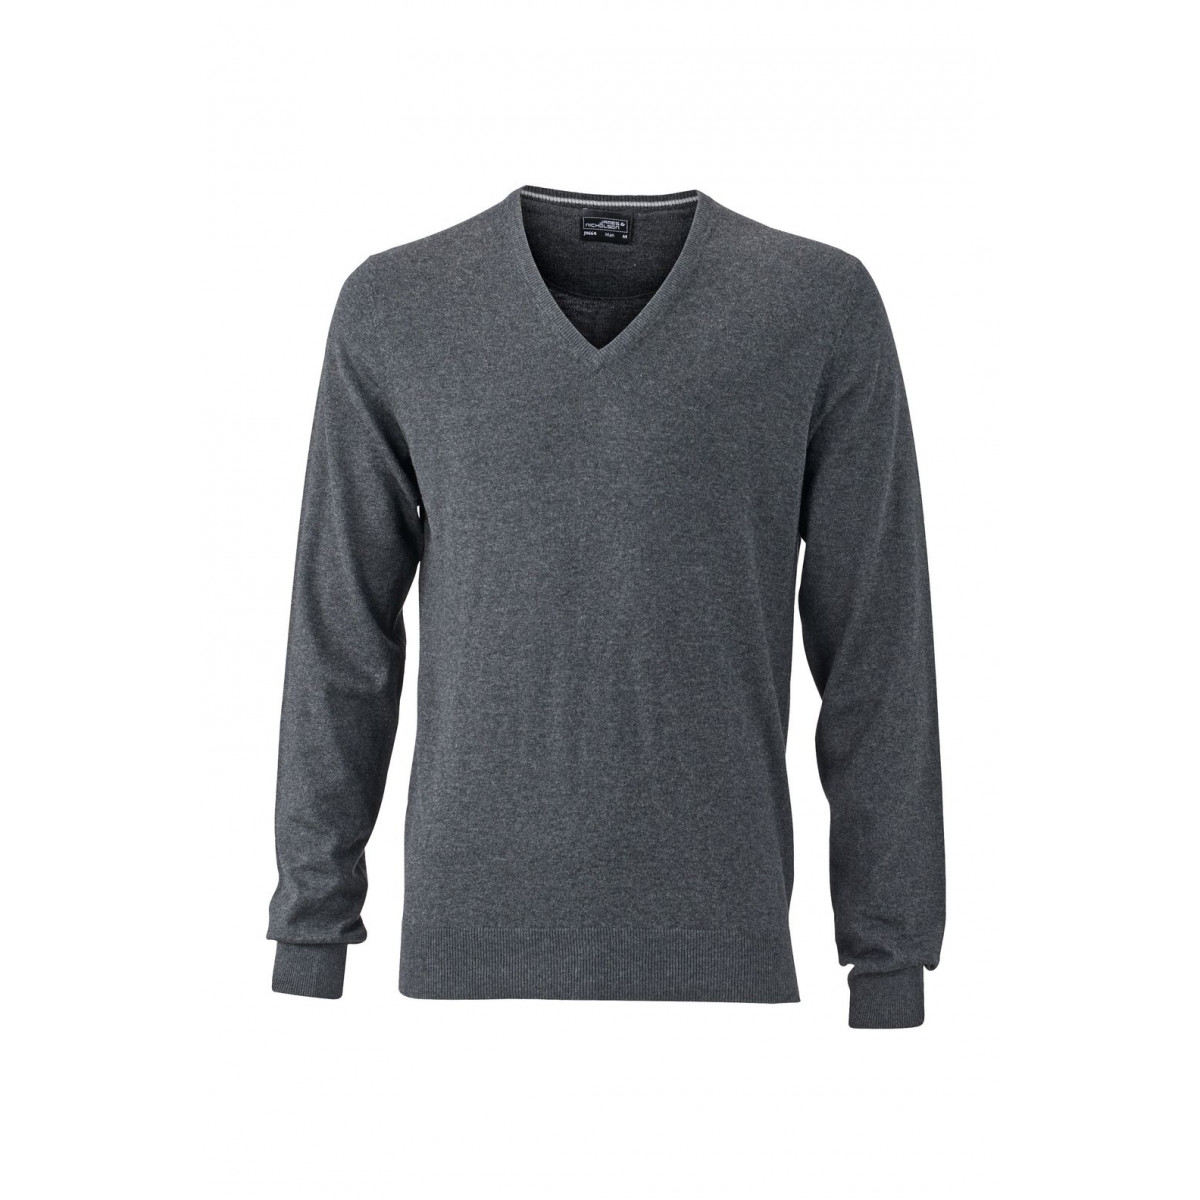 Пуловер мужской JN664 Mens Pullover - Темно-серый меланж